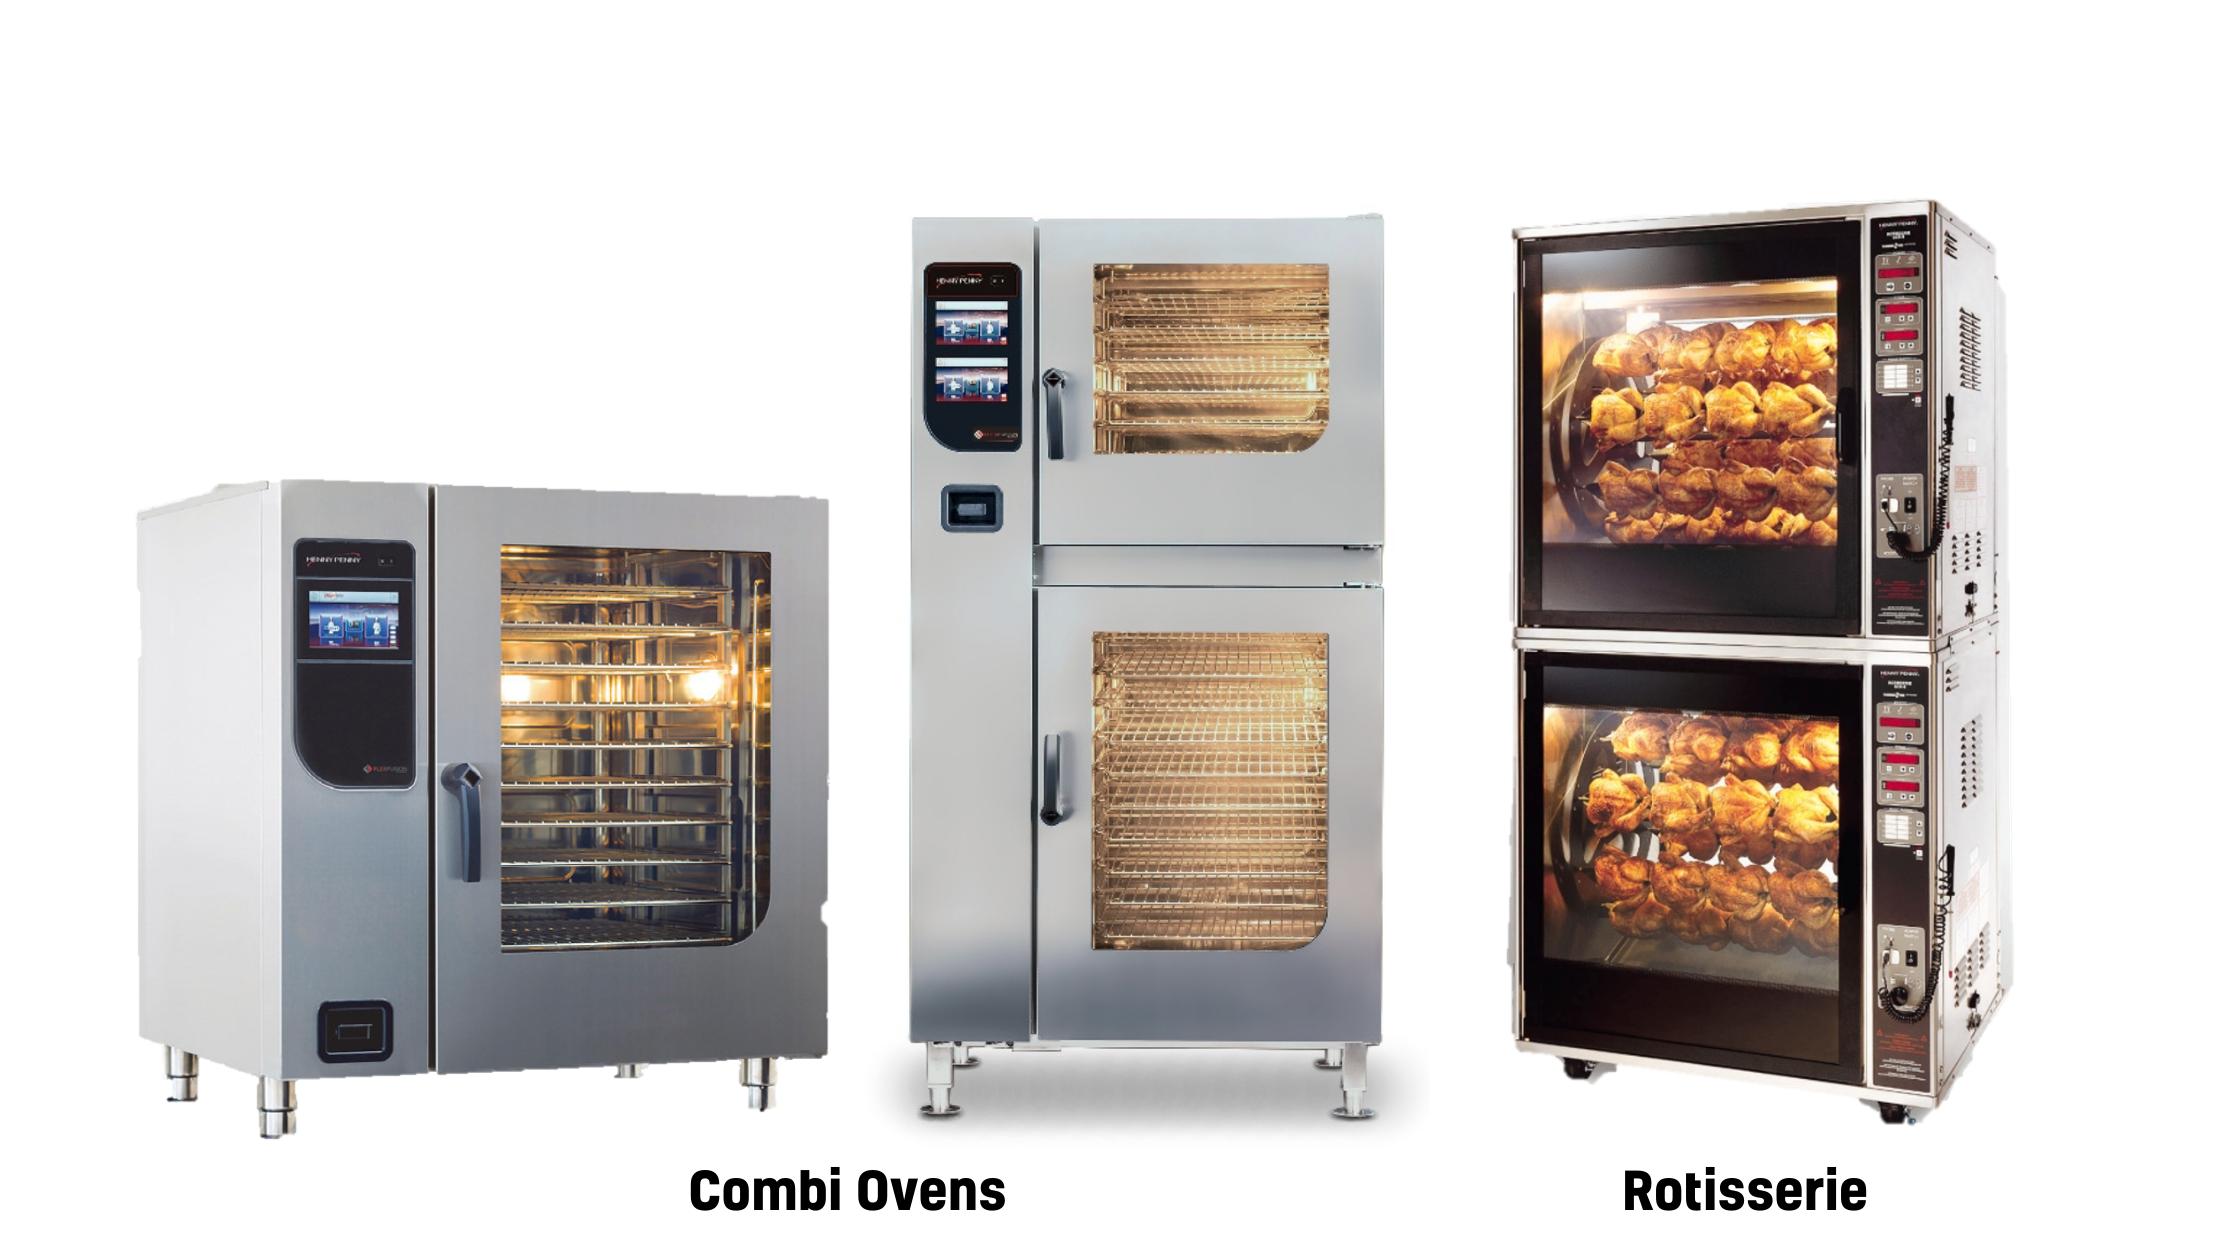 Combi Ovens, Rotisseries